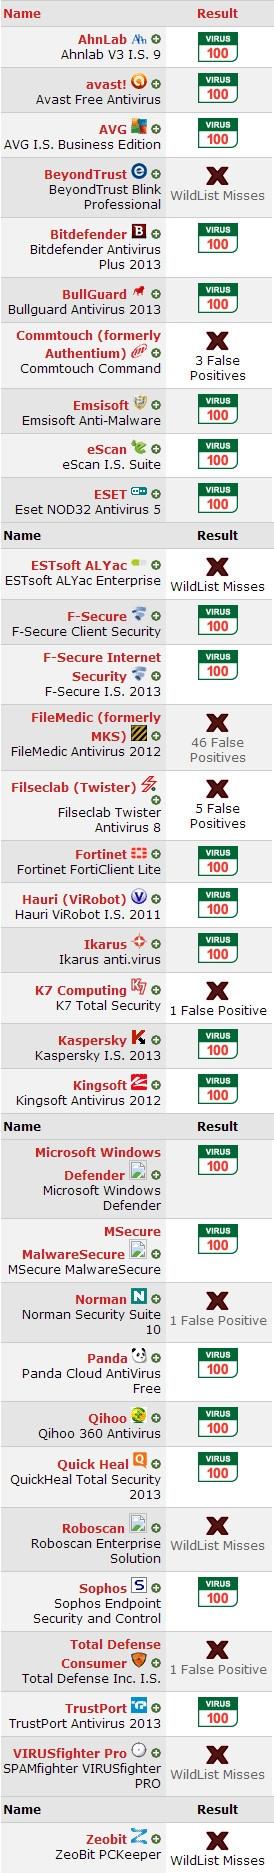 Windows 8平台VB100杀毒软件测试12月报告出炉